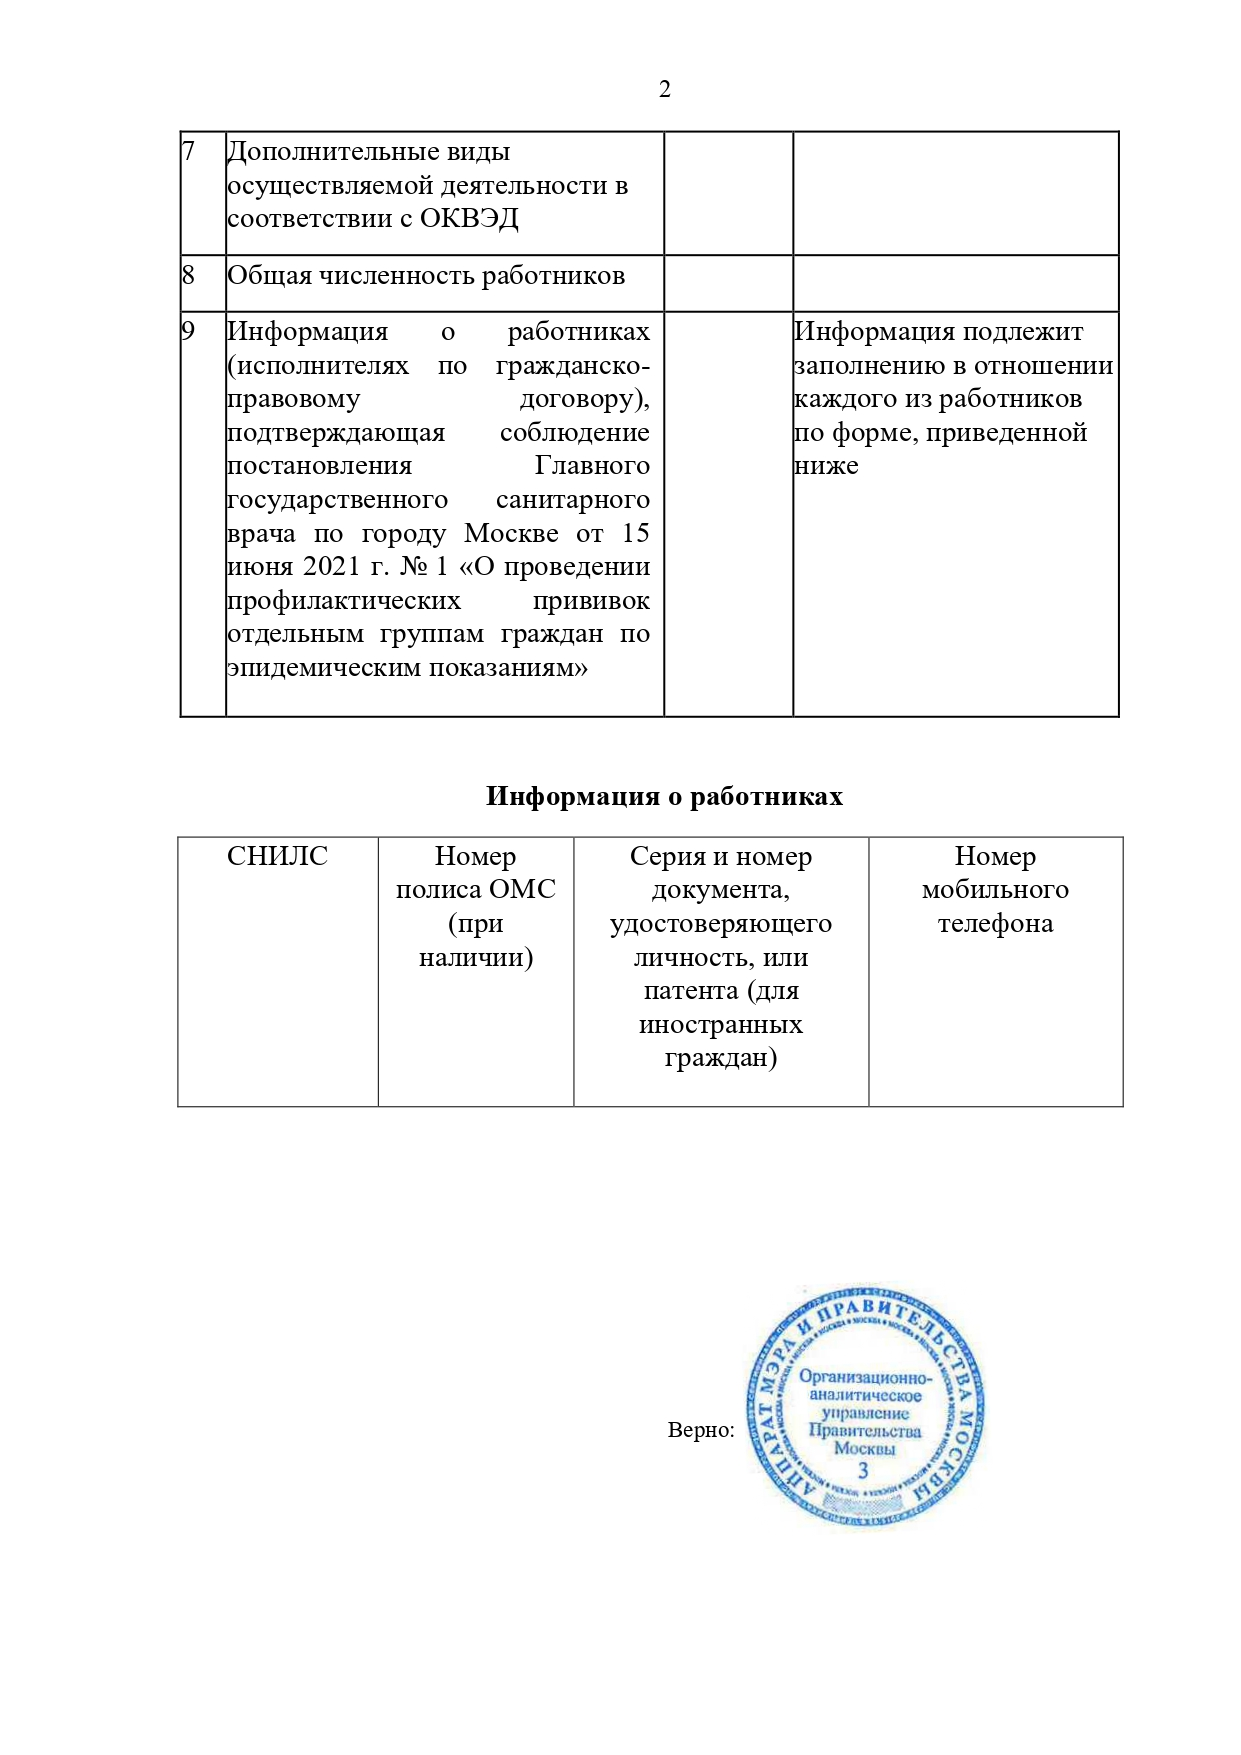 Указ Мэра Москвы N 32-УМ от 16.06.2021 об обязательной вакцинации от коронавируса - 5